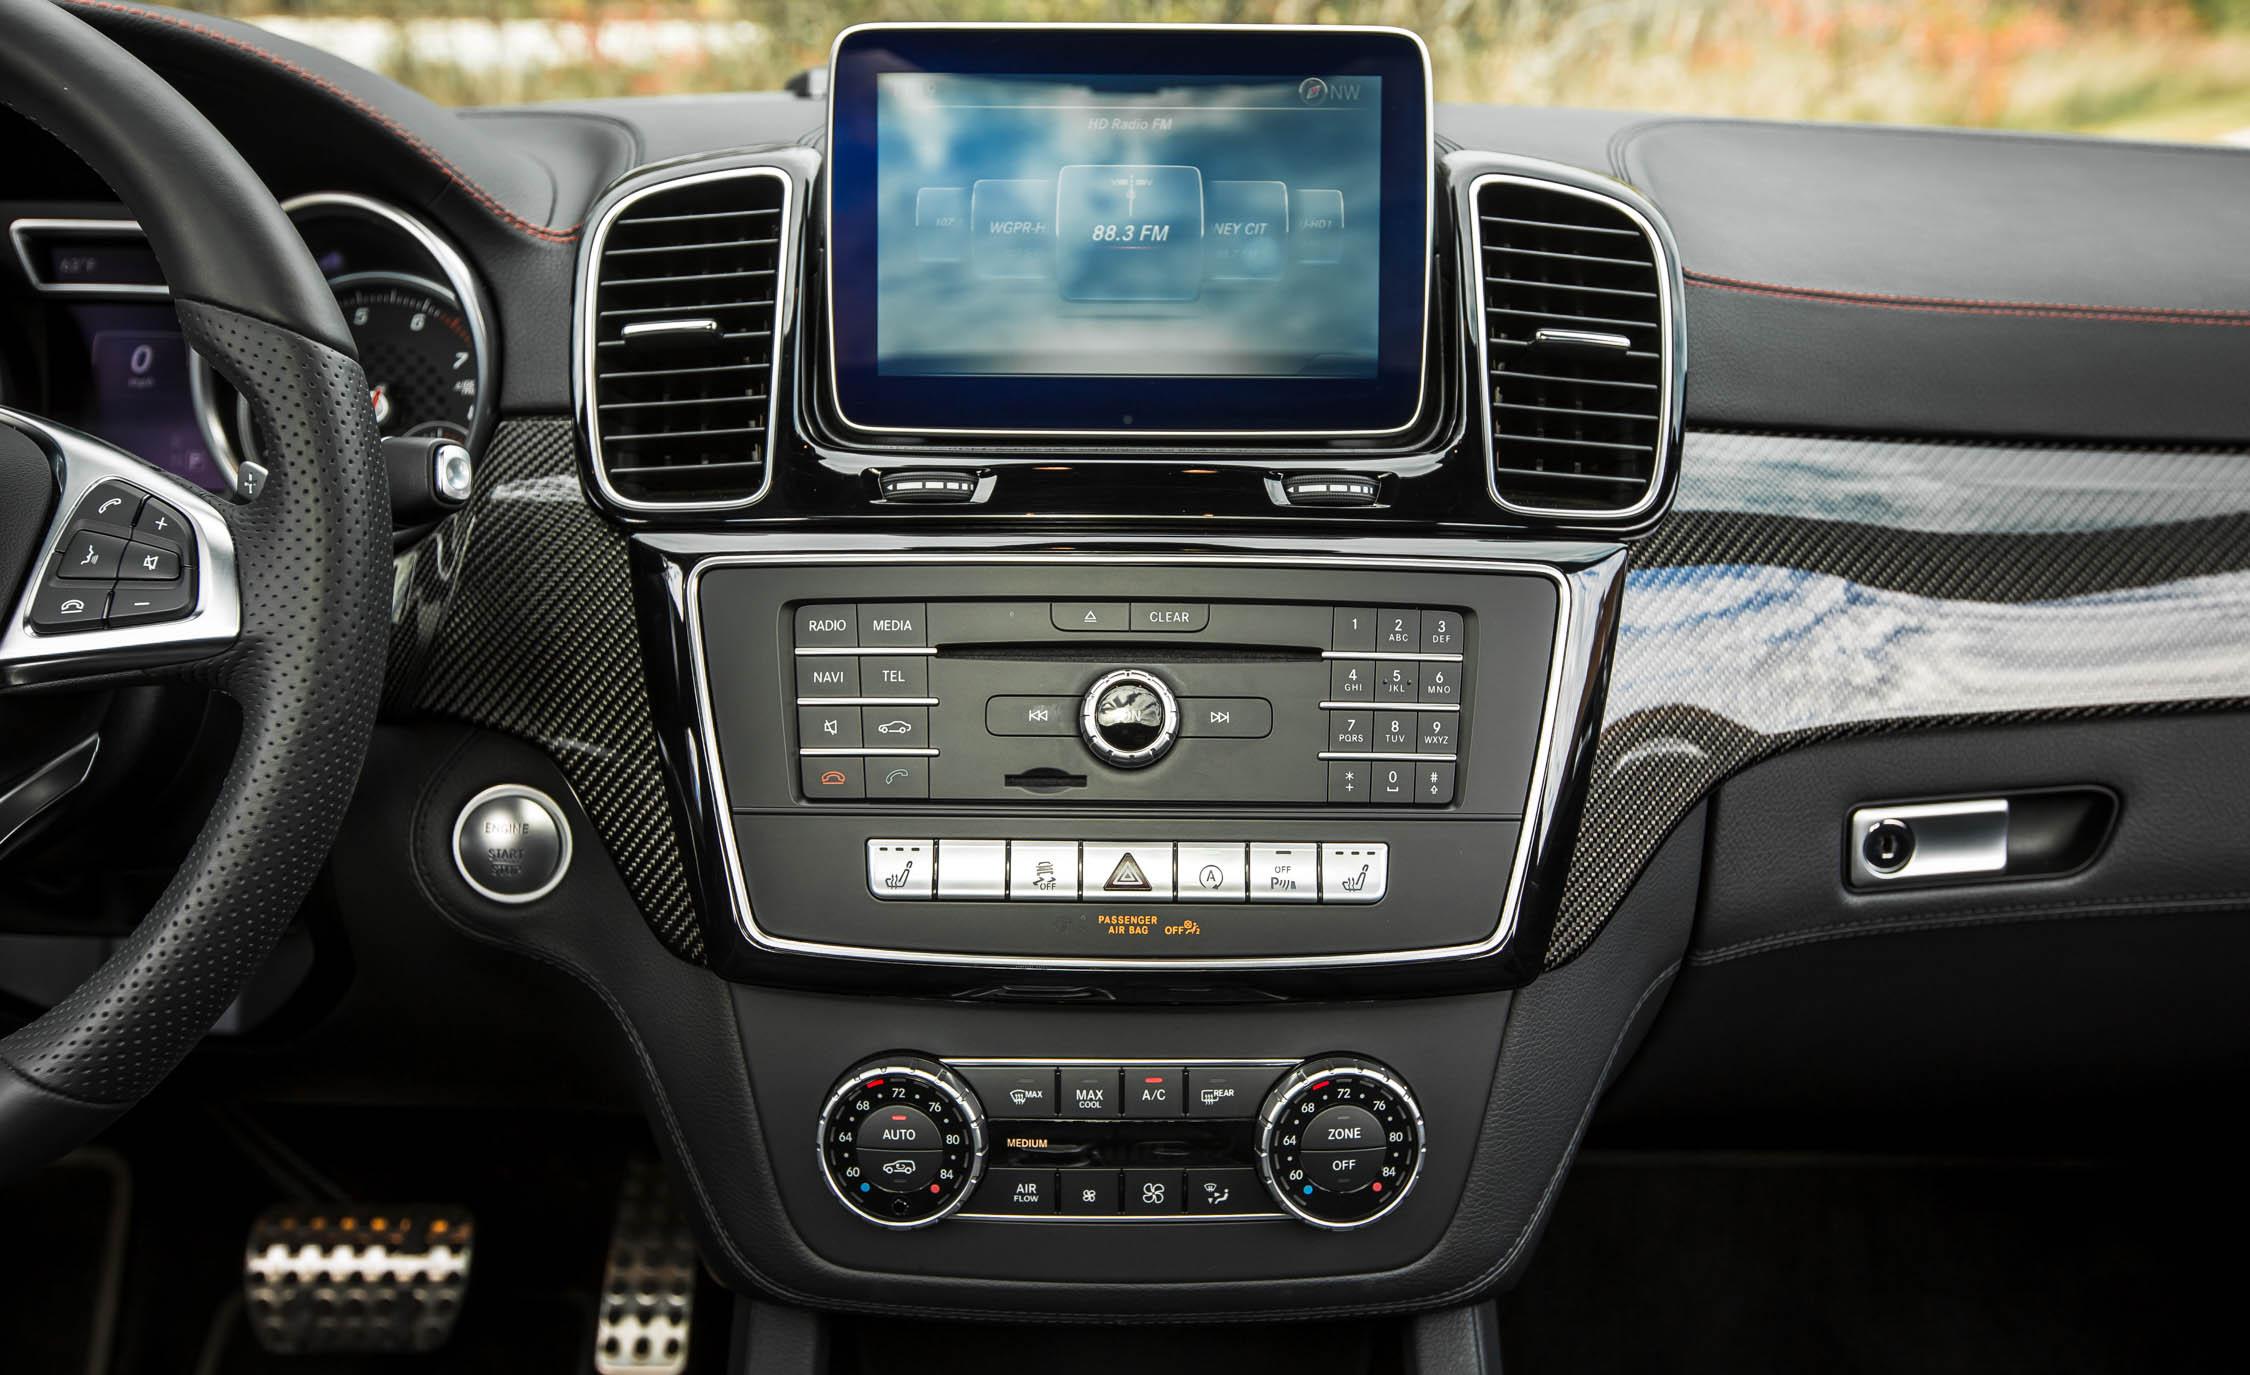 Center Head Unit Mercedes-Benz GLE450 AMG Coupe 2016